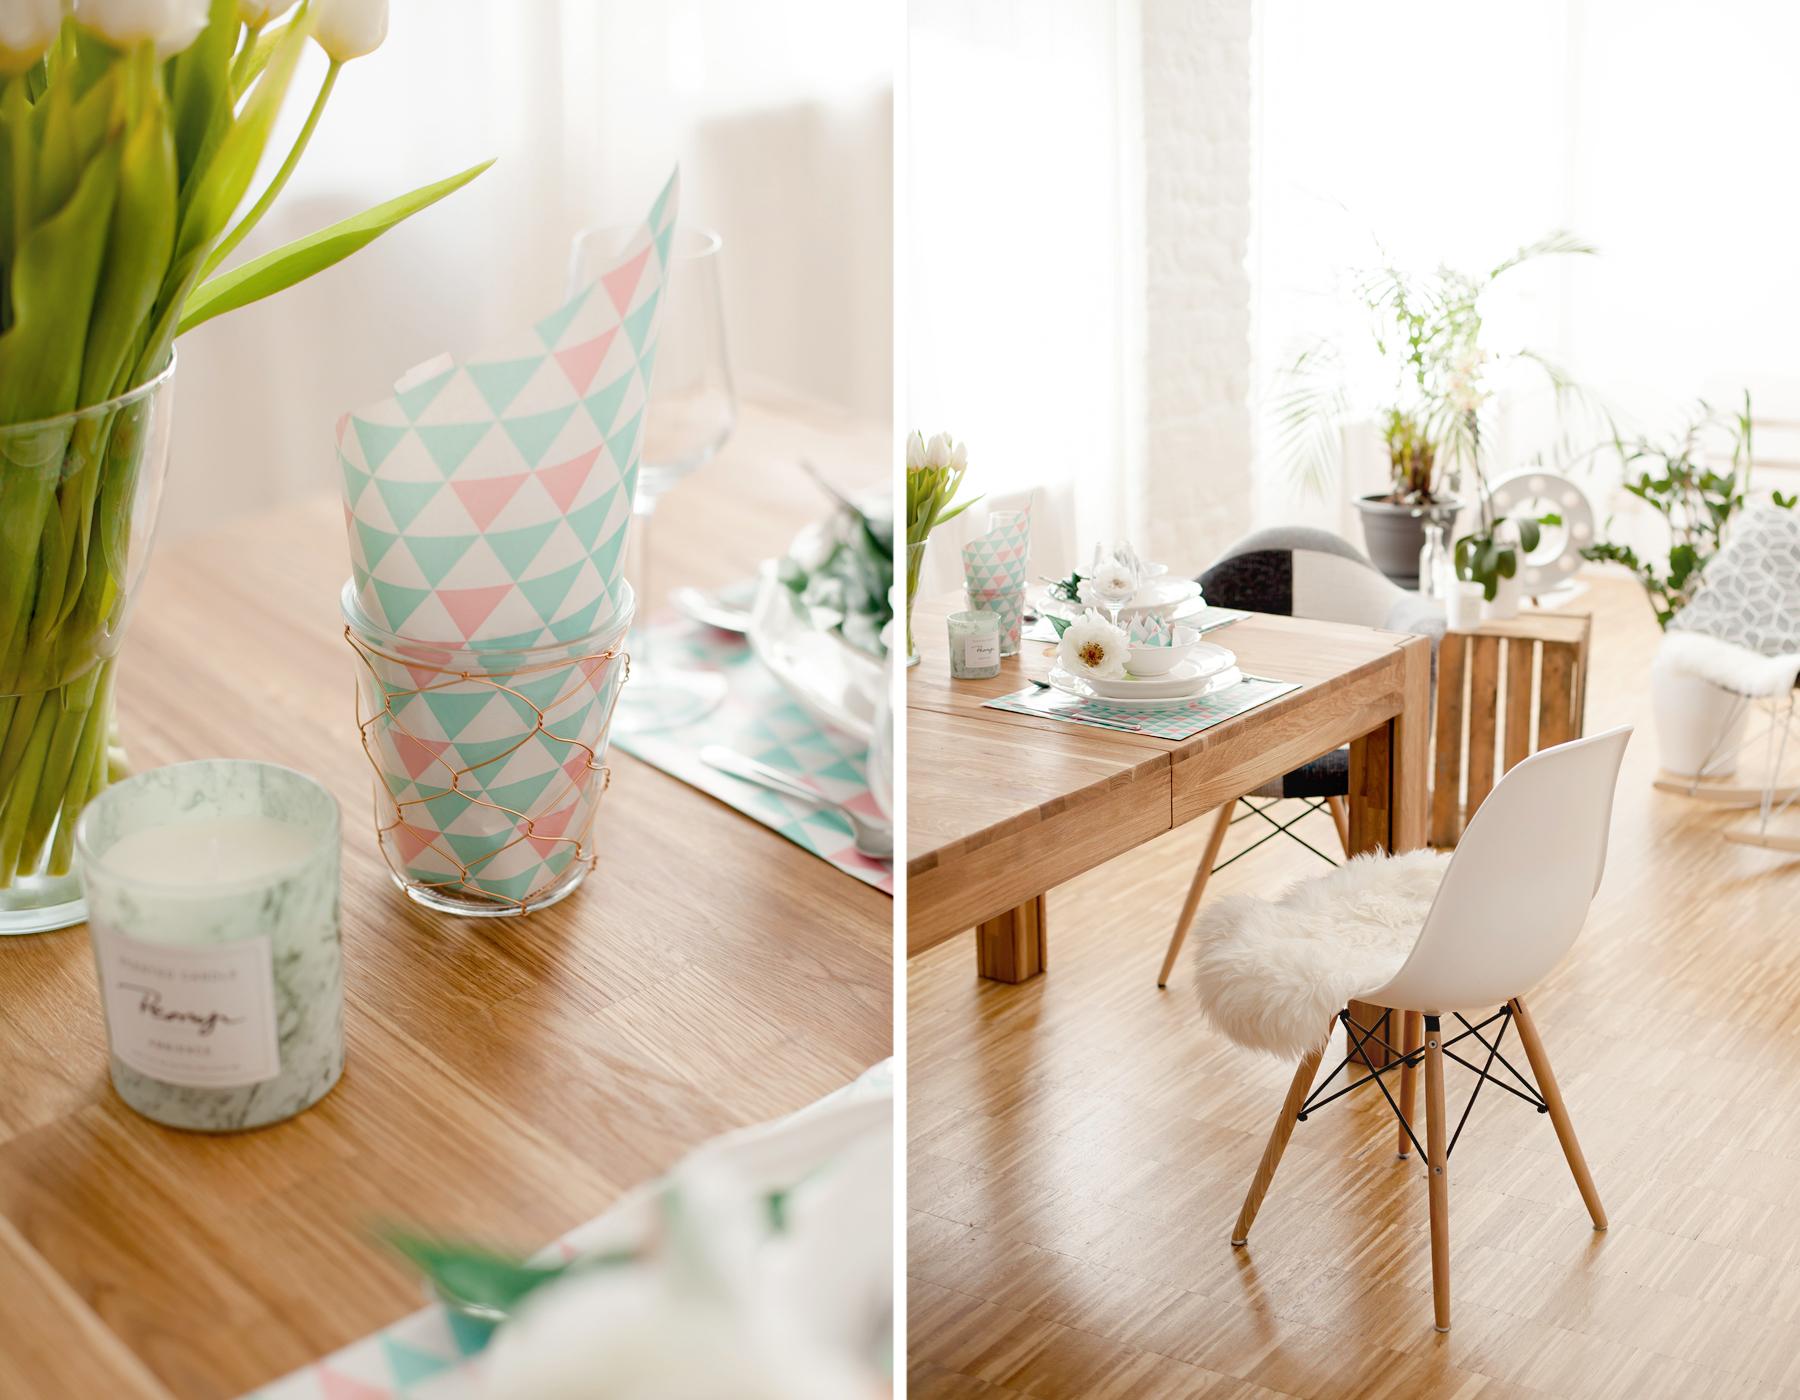 Fr Hlingshafte Tischdeko Lotus Origami Anleitung Cats